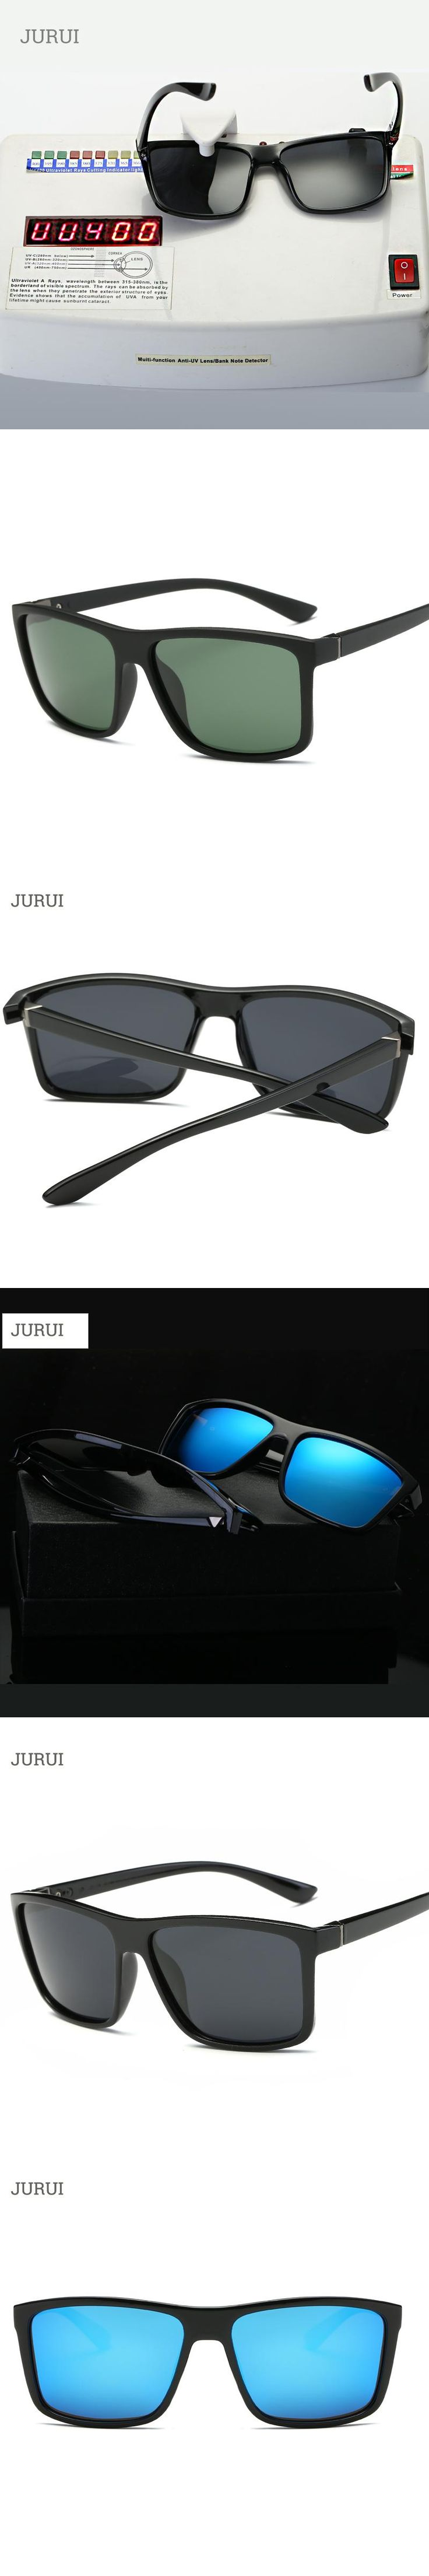 Brand Aluminium Unisex Polarized Mirror Lens Vintage Eyewear Retro Police Sunglasses Driving Sun Glasses For Men/Women